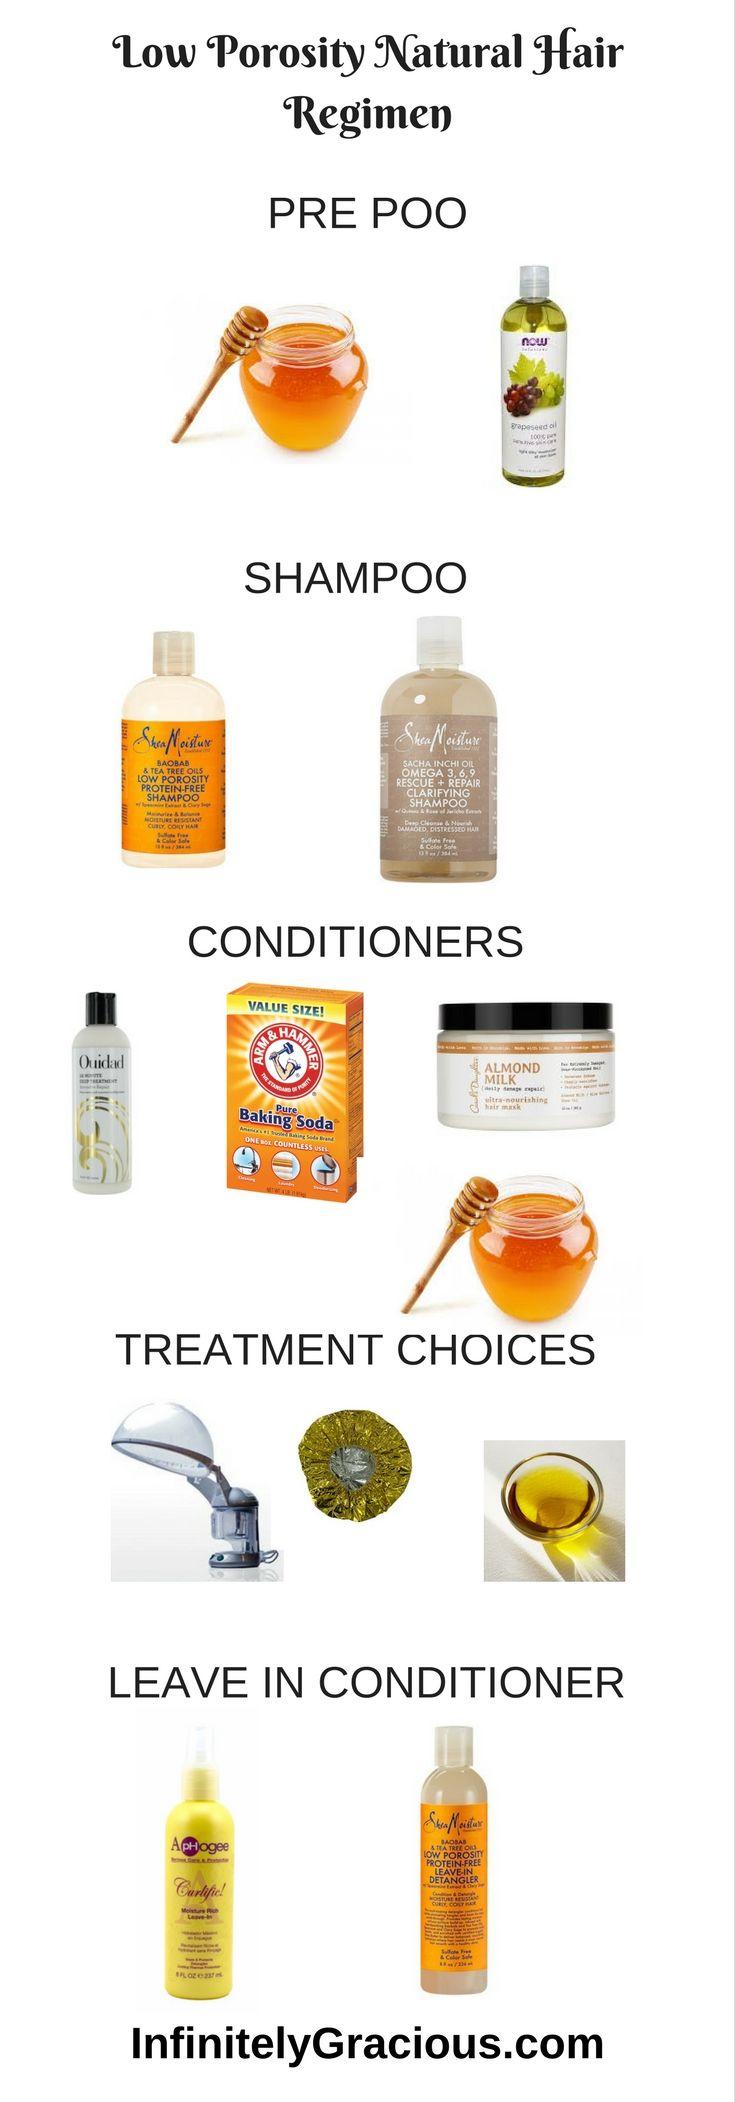 Low hair porosity regimen that works! Use the Hair porosity test to build an Epic Natural Hair Regimen that Works.